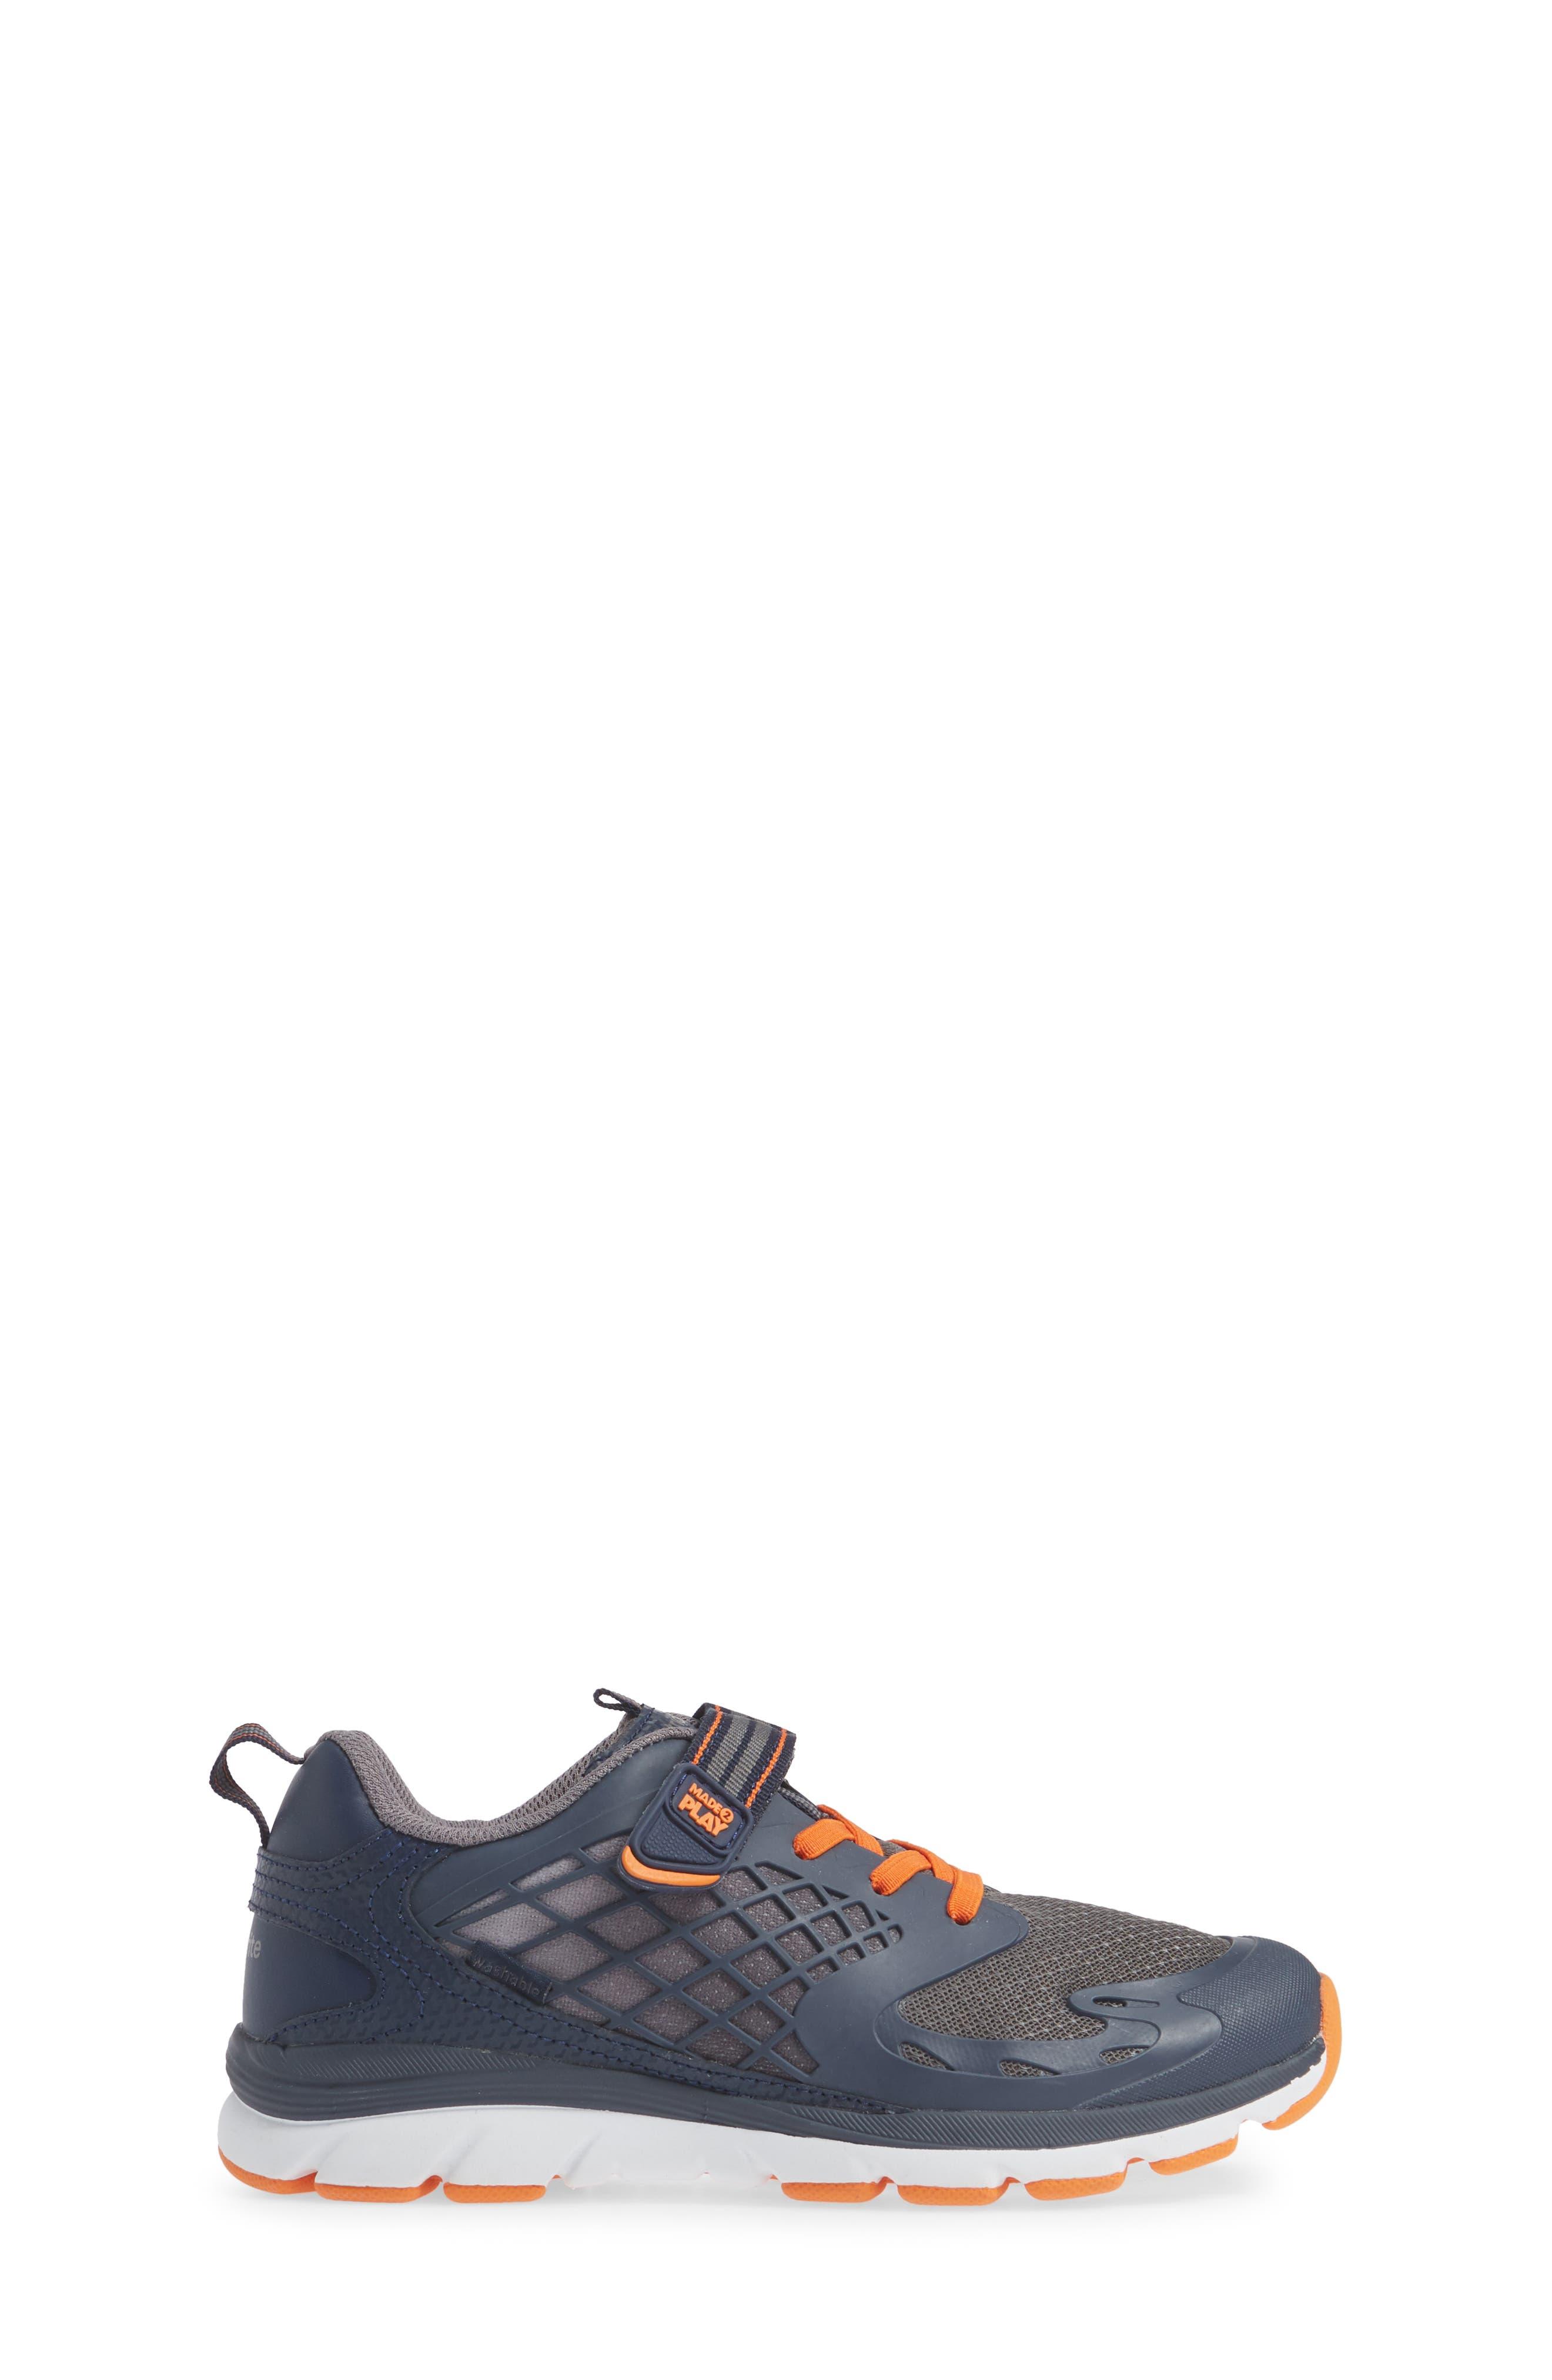 Made 2 Play Breccen Sneaker,                             Alternate thumbnail 3, color,                             NAVY/ ORANGE